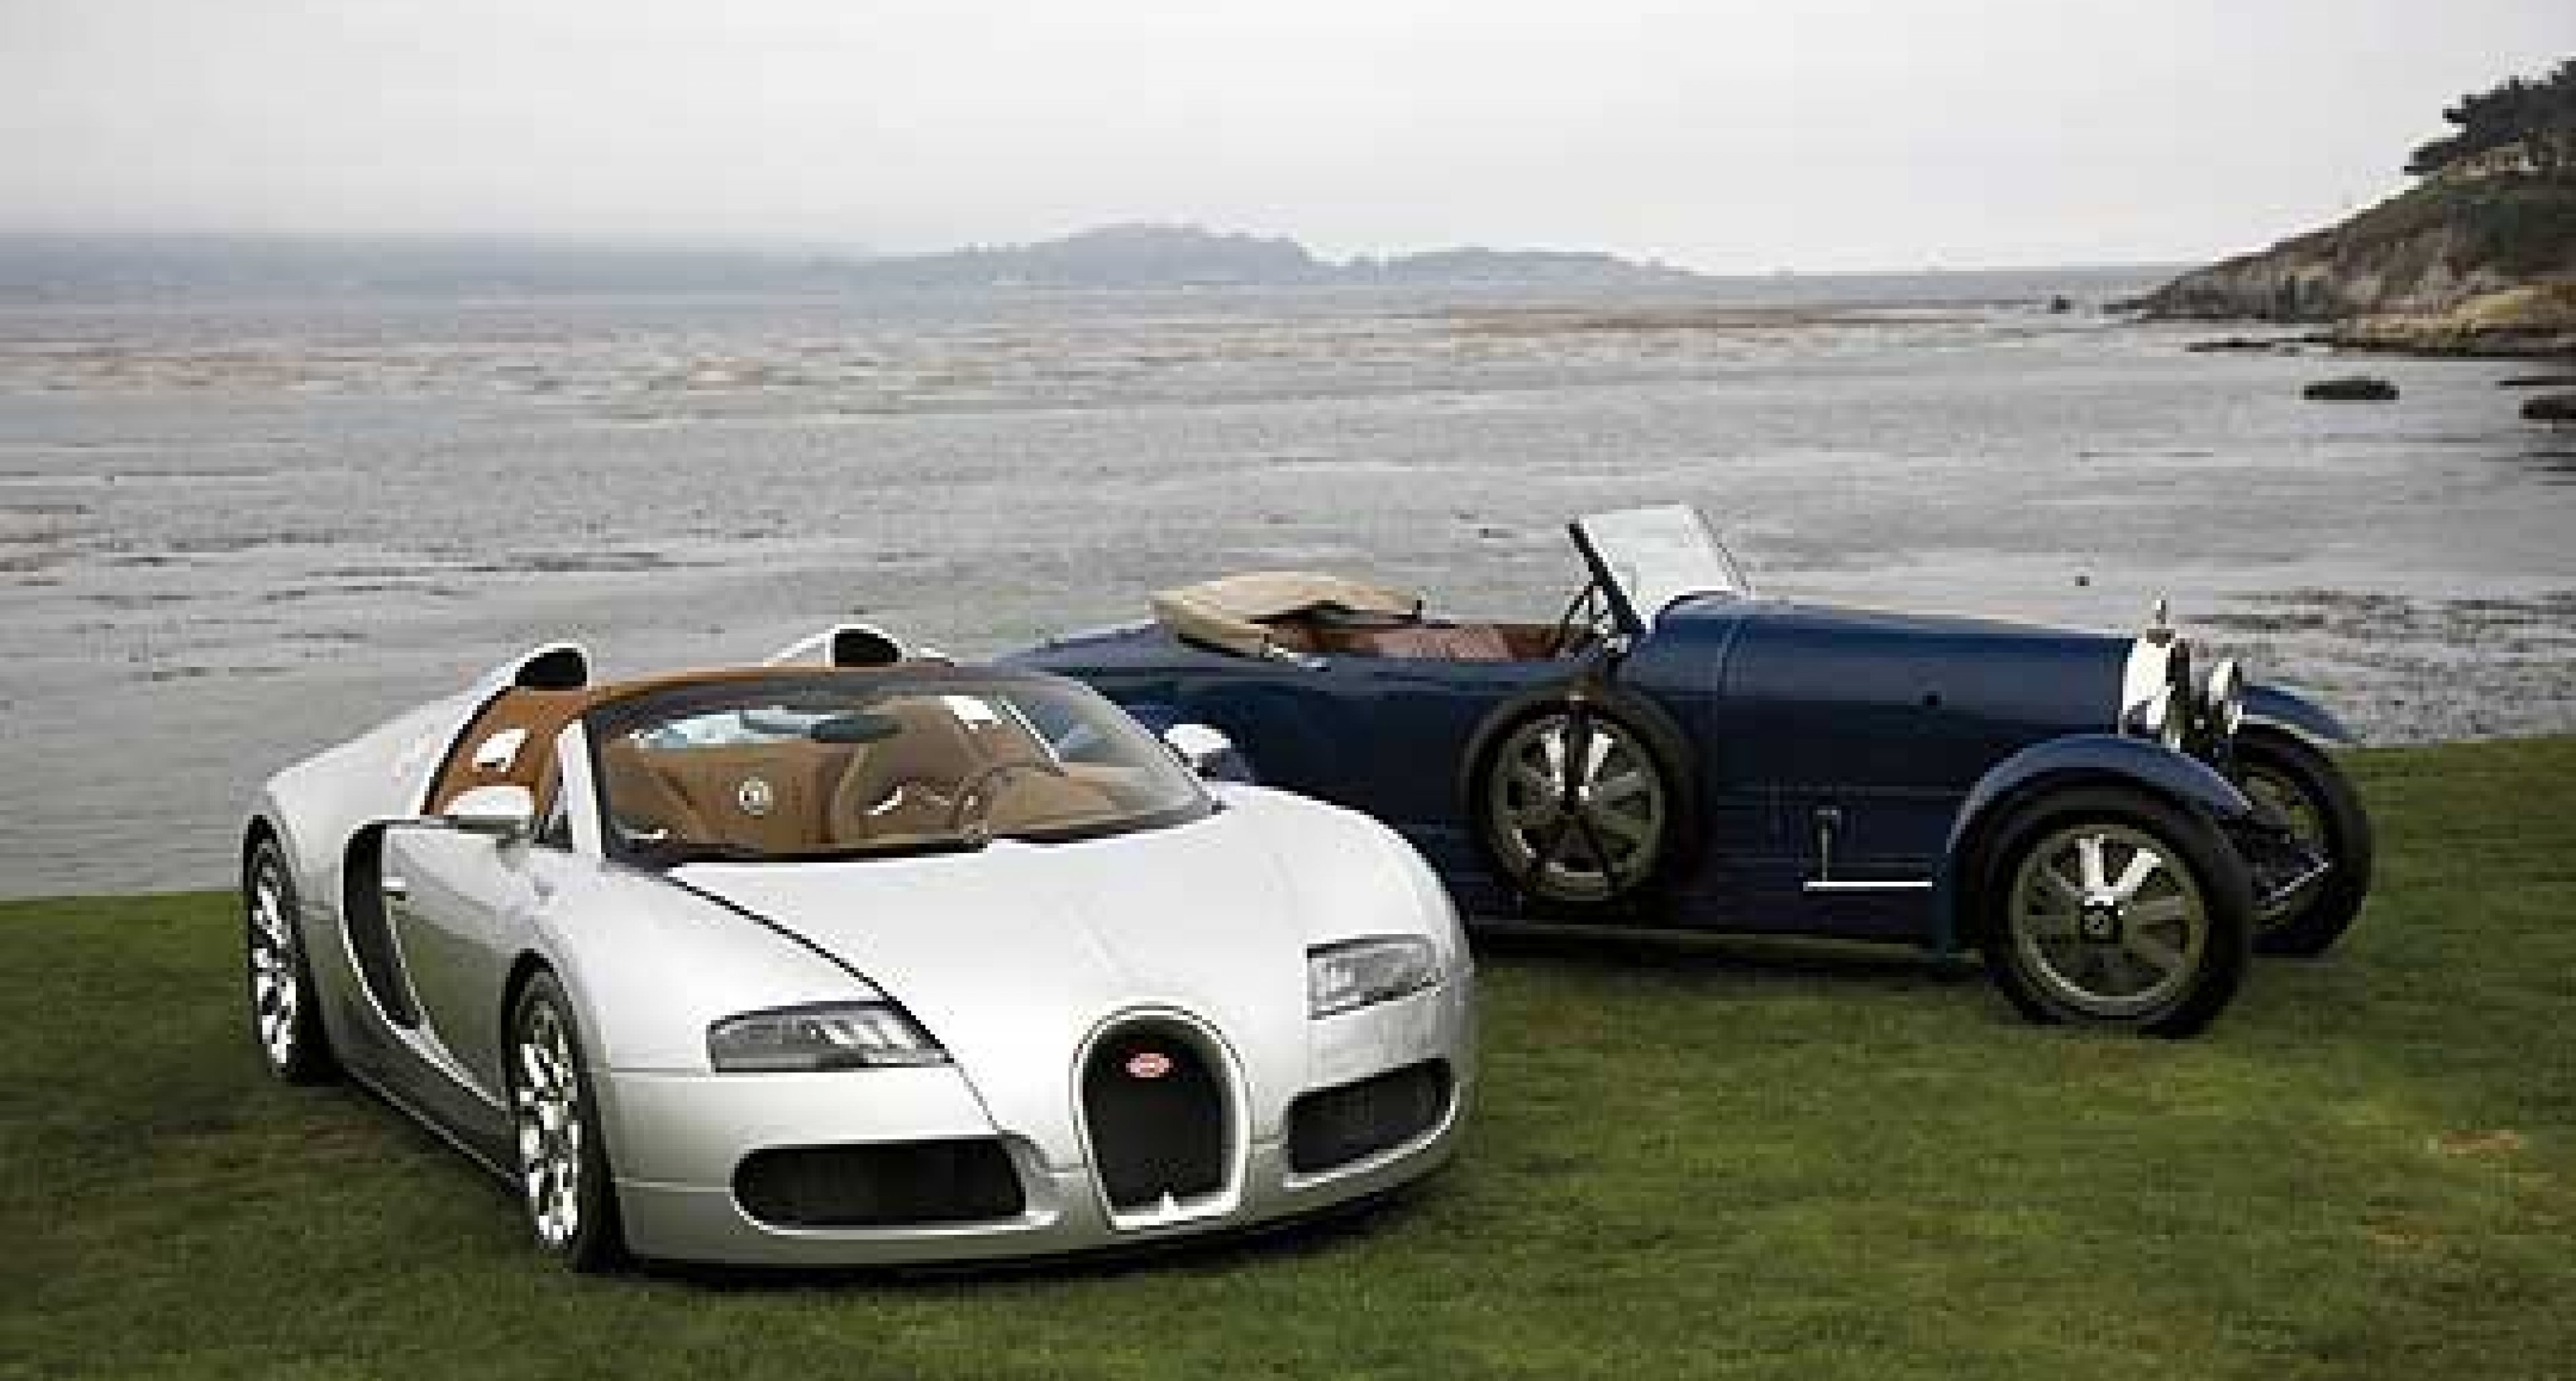 Bugatti Veyron 16.4 Grand Sport Launched at Pebble Beach